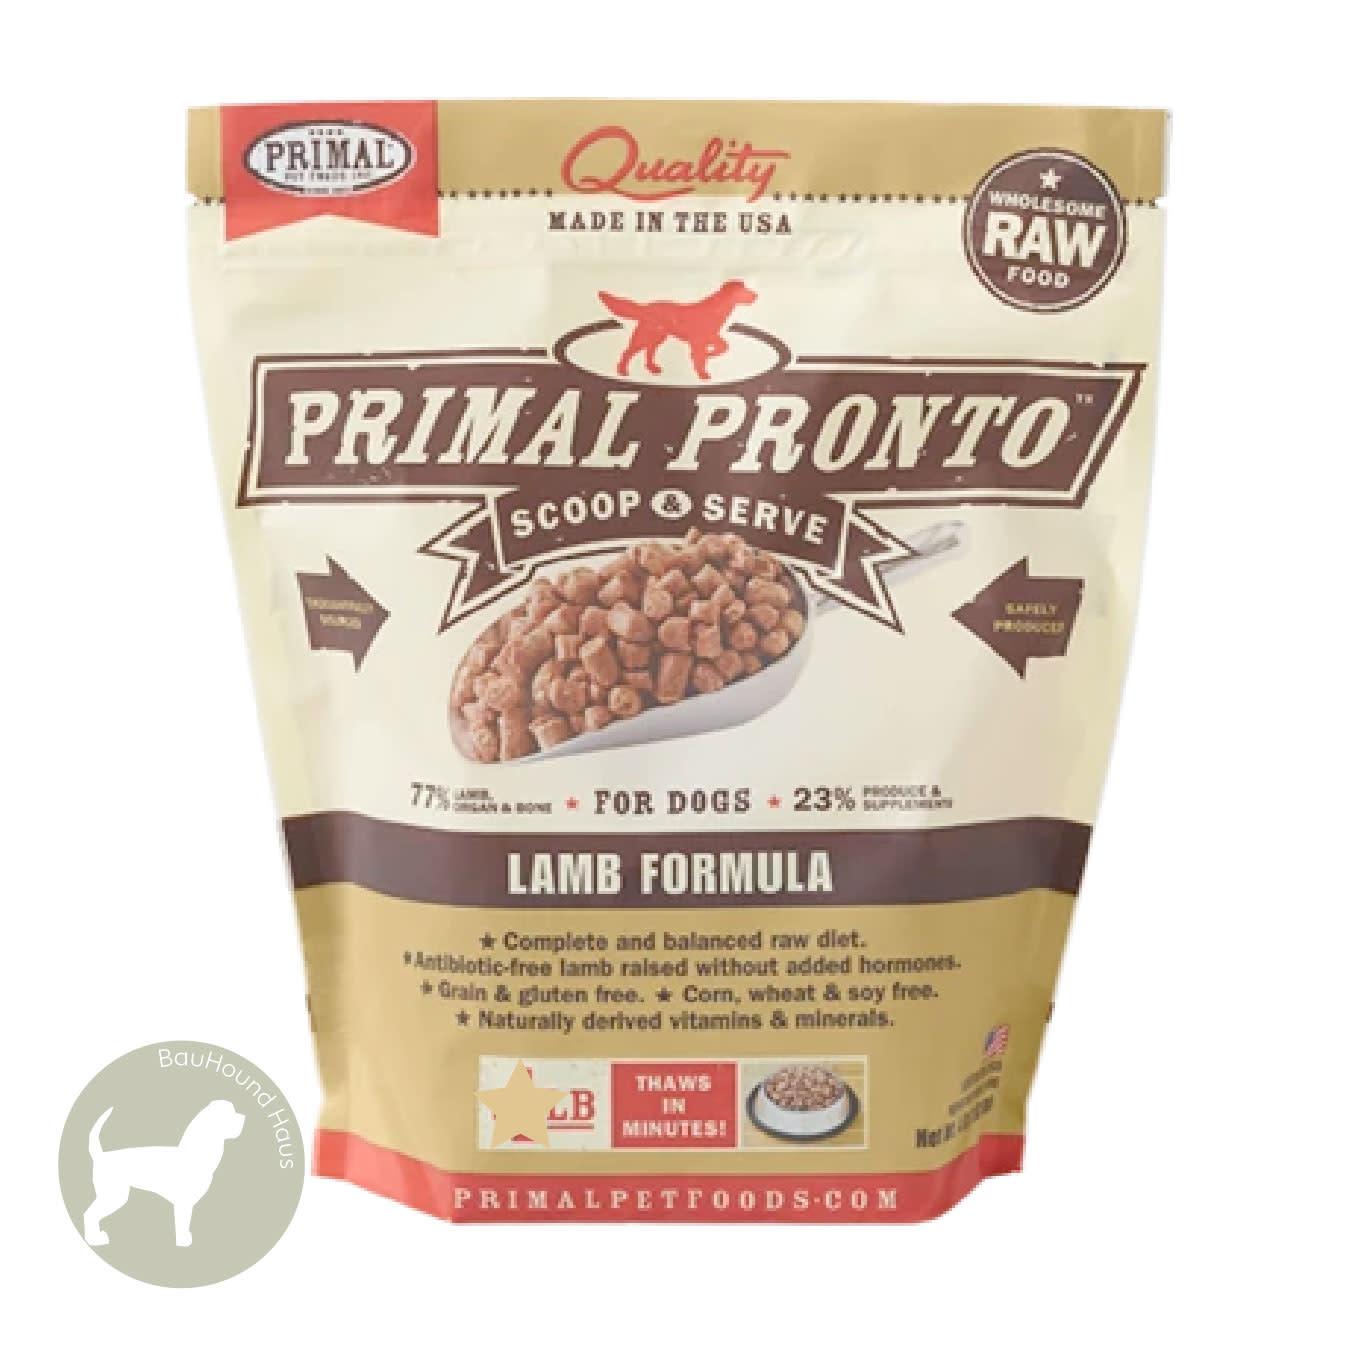 Primal Pet Foods Primal Pet Foods Pronto Canine Lamb Formula, 4lb